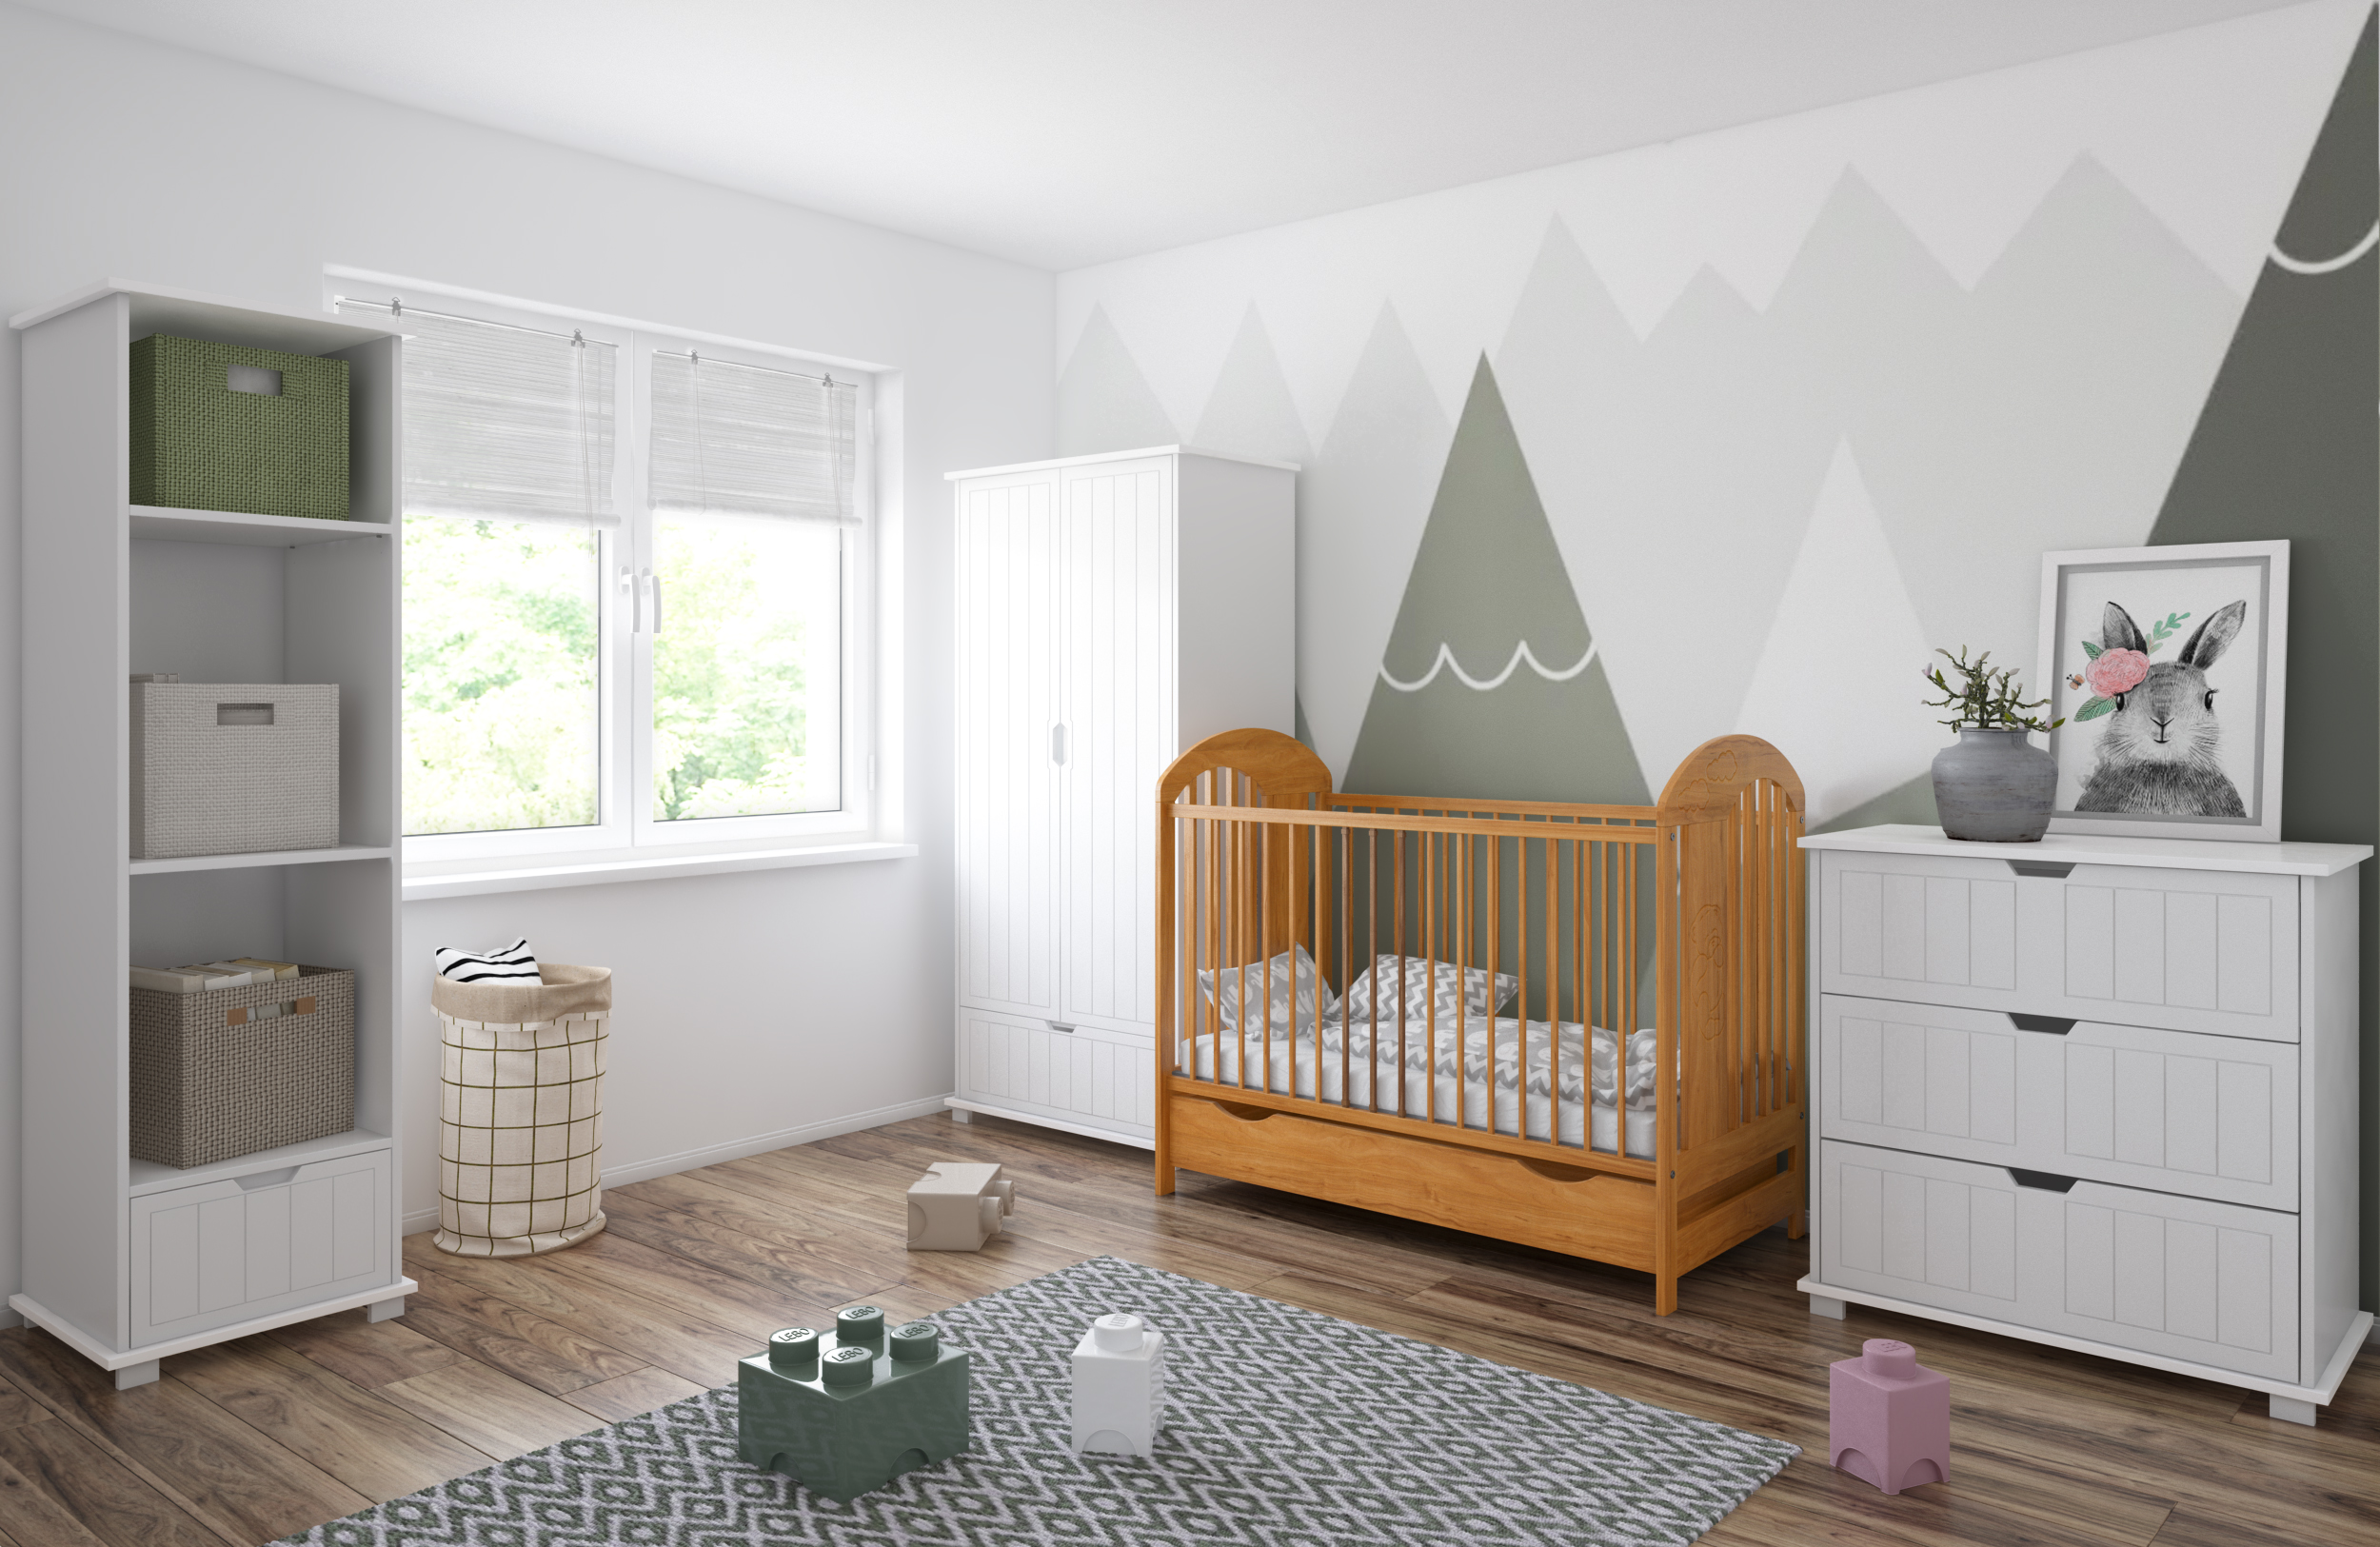 image Just Baby Κρεβάτι με Συρτάρι Pumba NATURAL